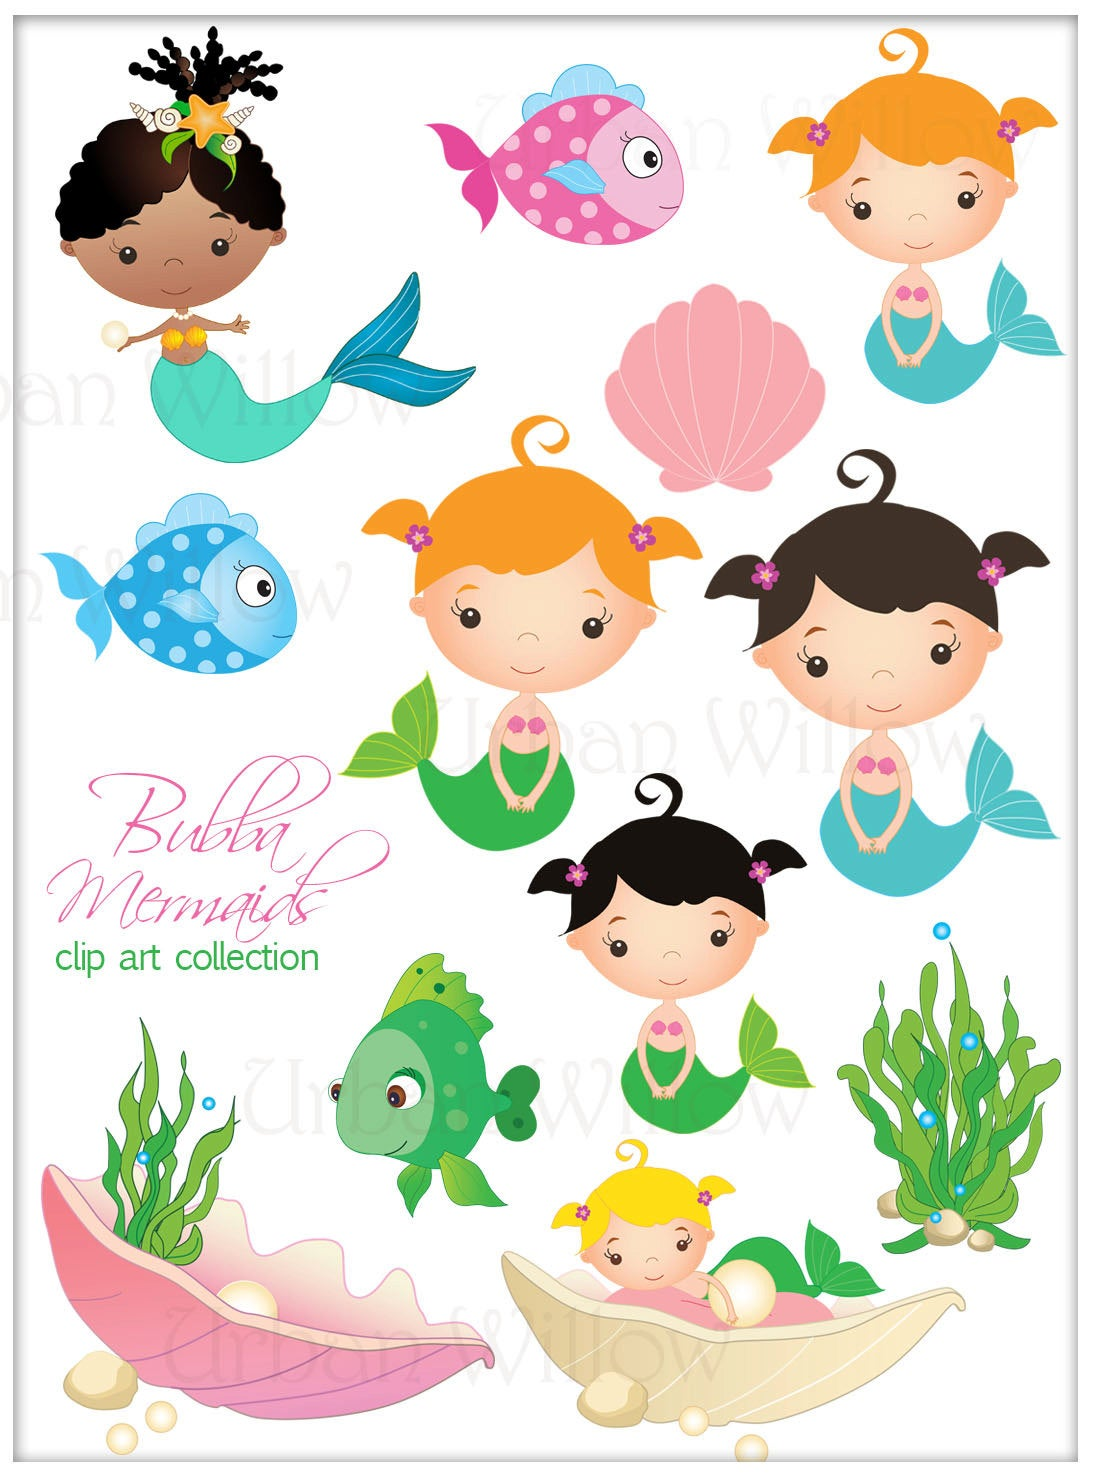 Mermaid Clipart, Cute Mermaid Clipart, Seaweed and Fish Graphics, Digital  Clipart Mermaid, African American Mermaid, Cute fish Clipart.